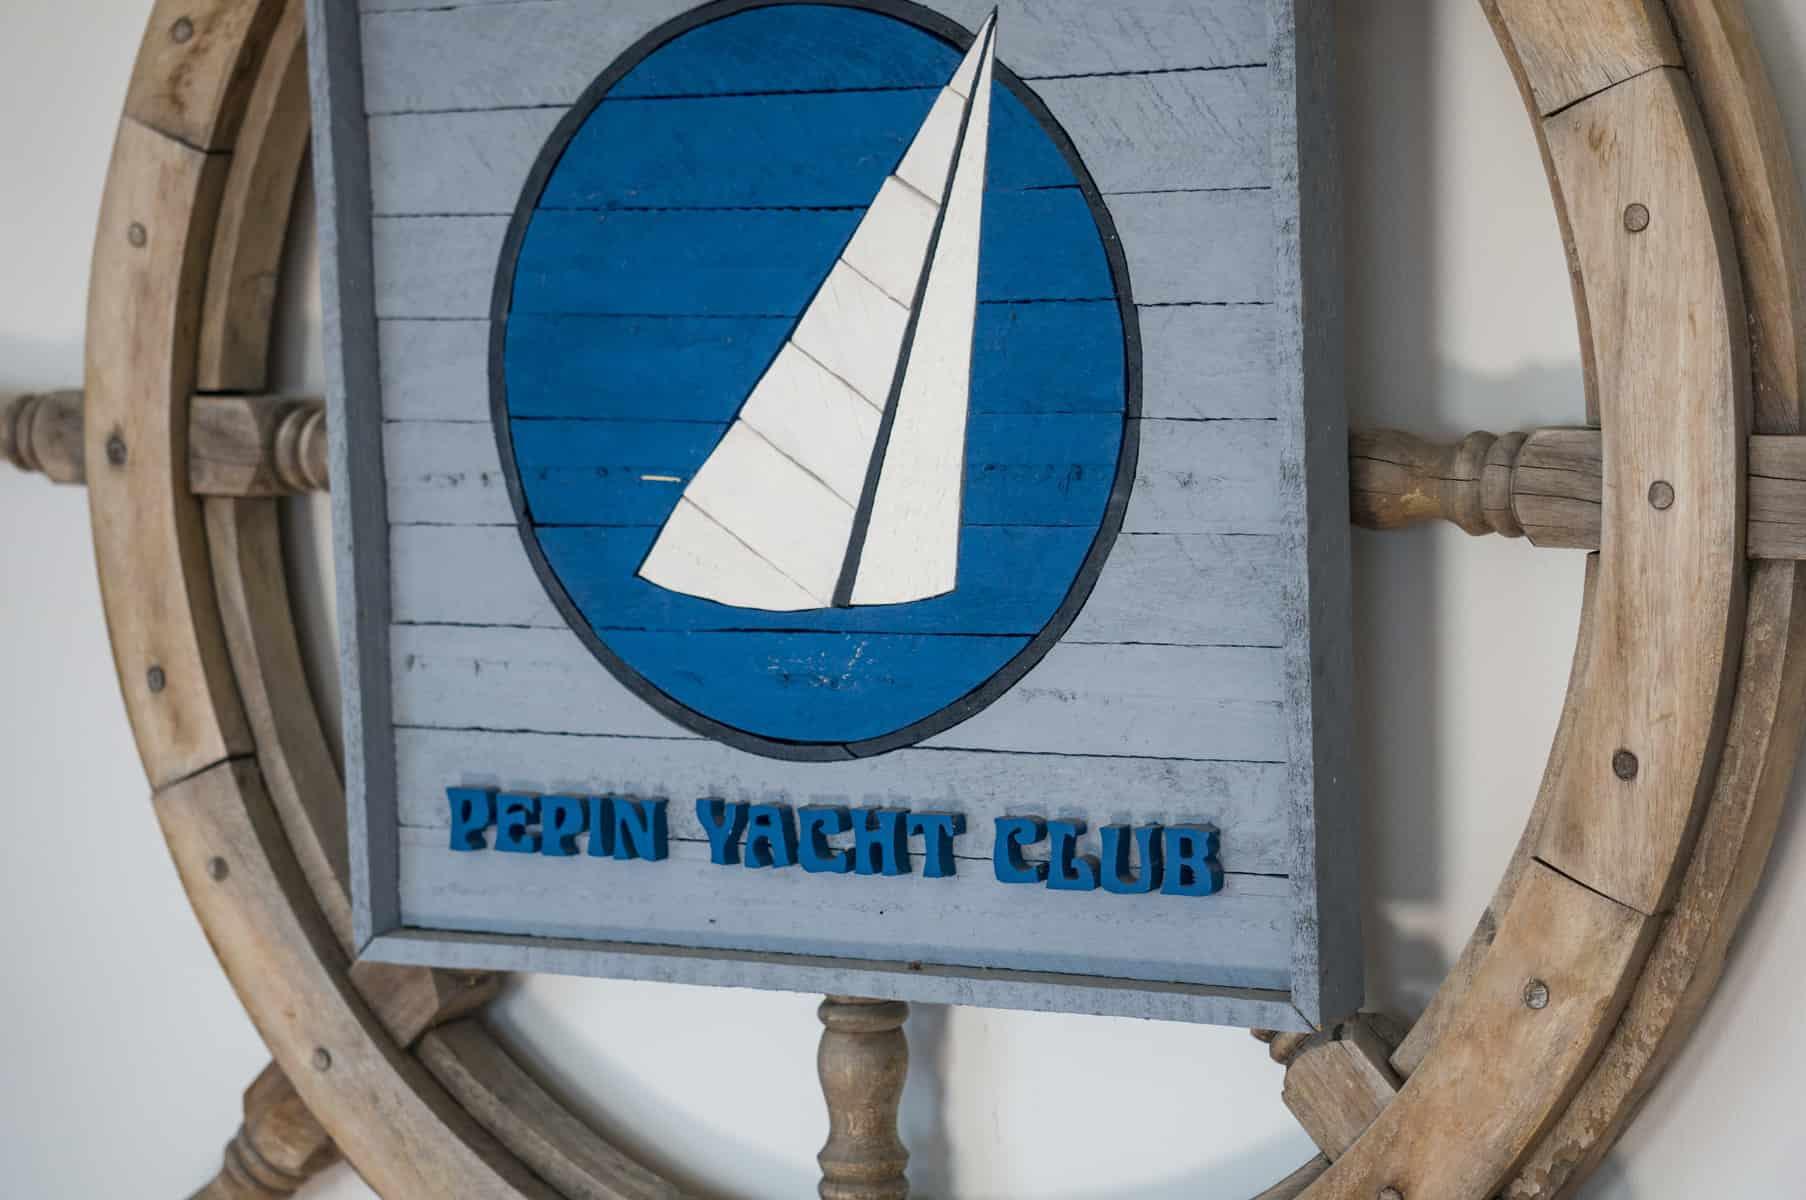 Pepin Yacht Club